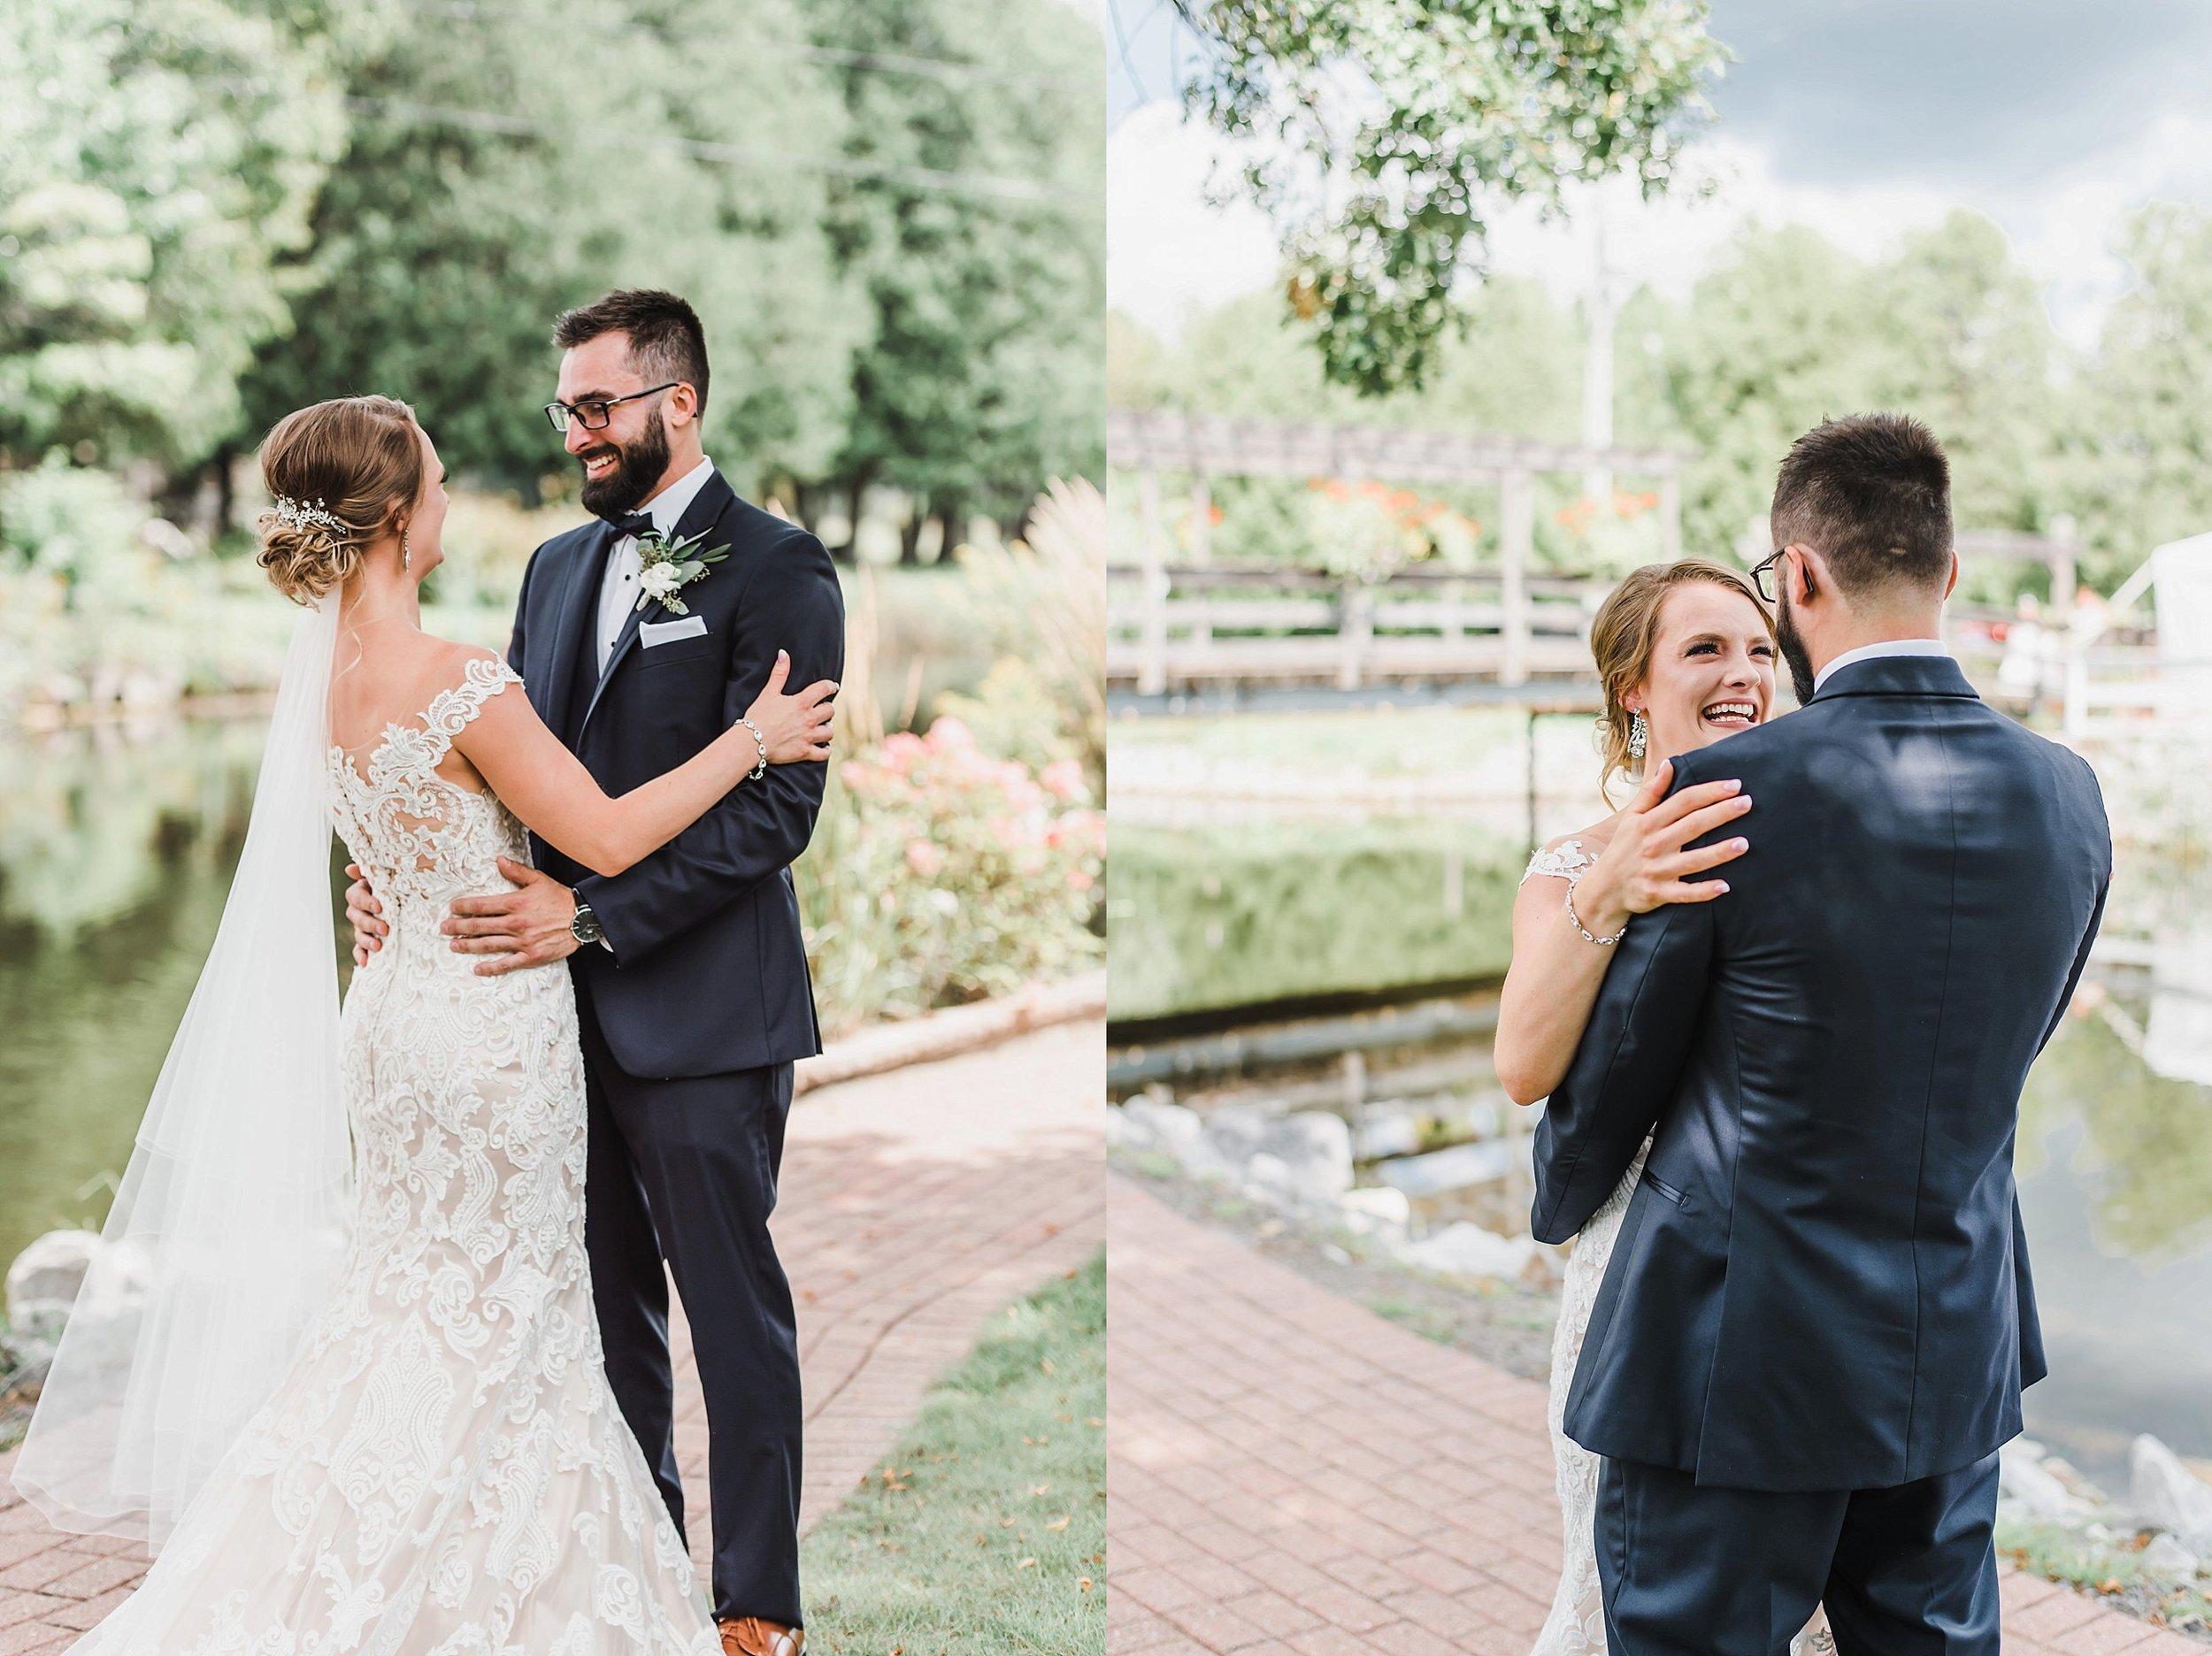 light airy indie fine art ottawa wedding photographer | Ali and Batoul Photography_1240.jpg